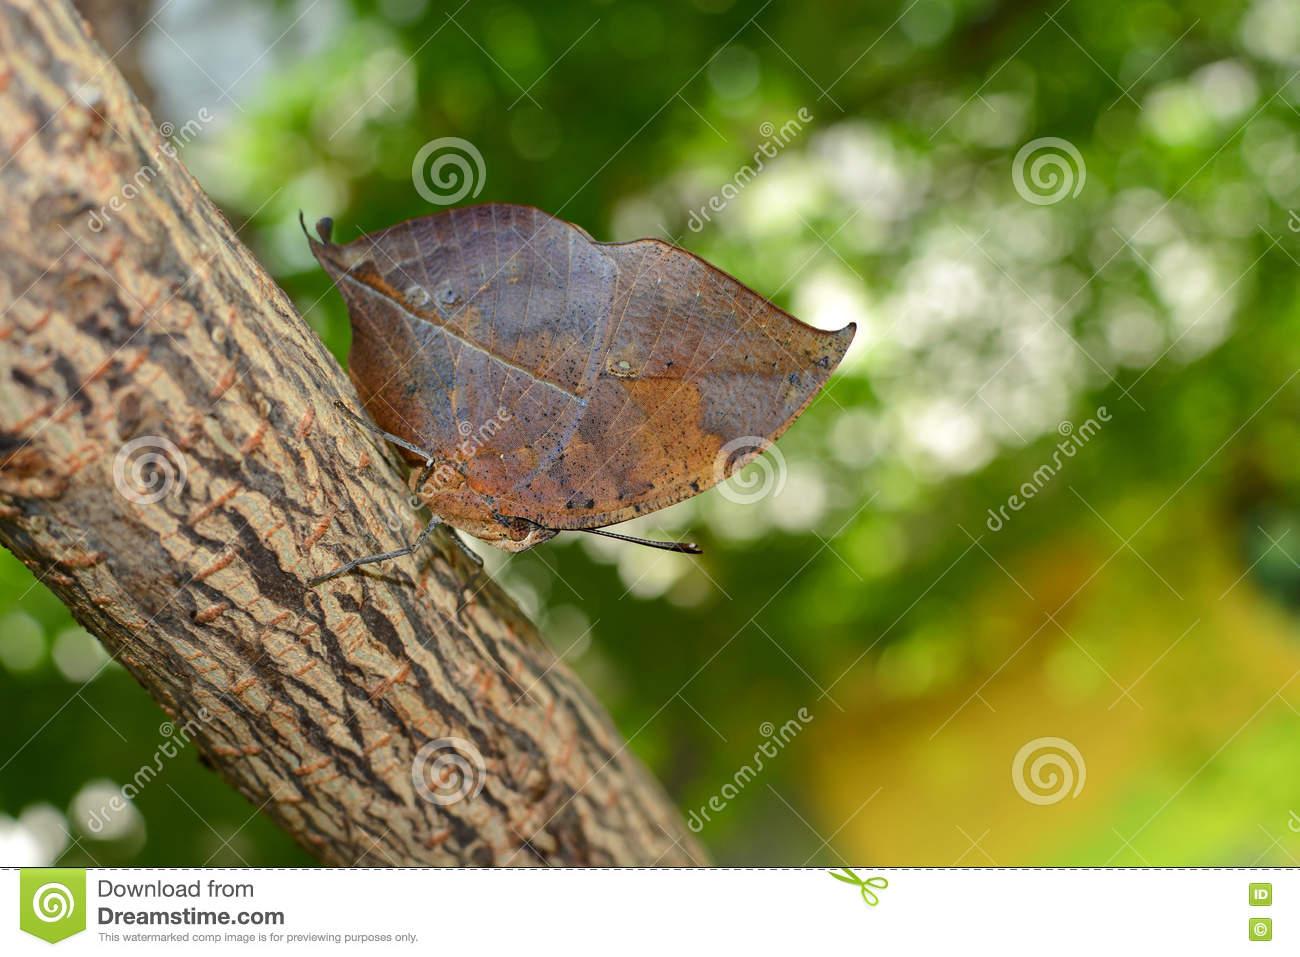 Orange Oakleaf Butterfly With Oak Leaf Camouflage Adaptation.